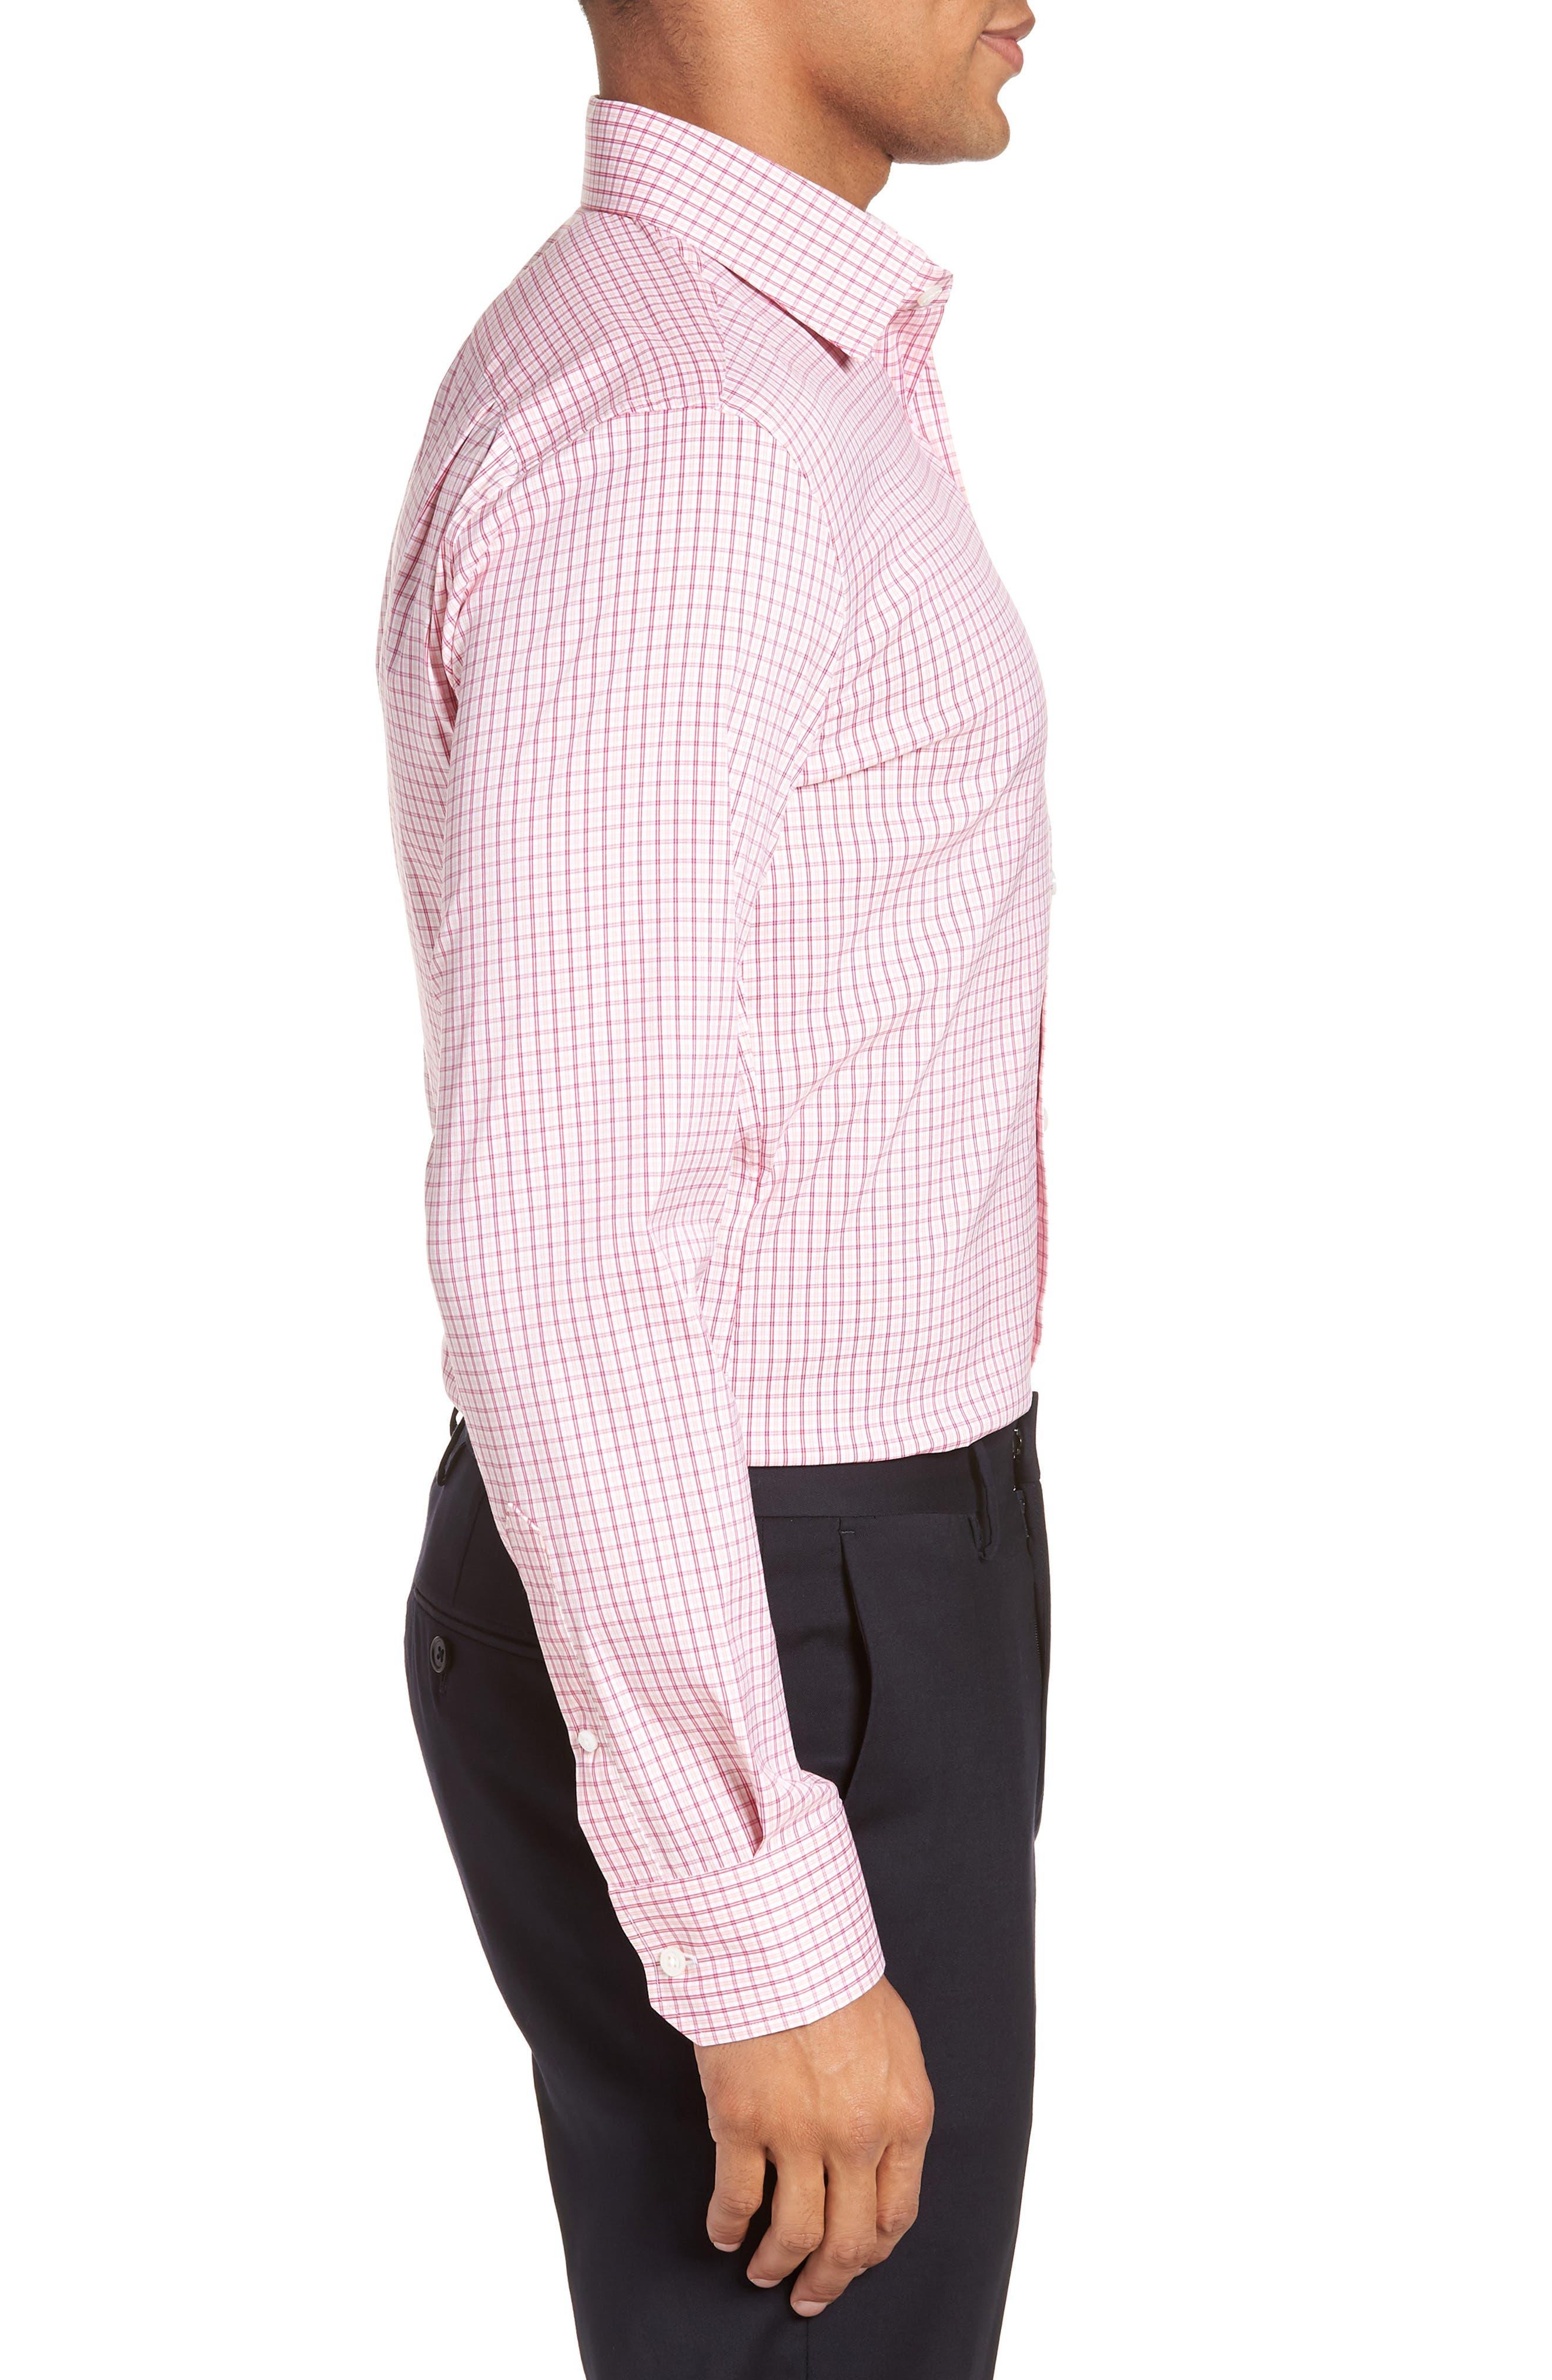 Jetsetter Slim Fit Stretch Check Dress Shirt,                             Alternate thumbnail 4, color,                             650